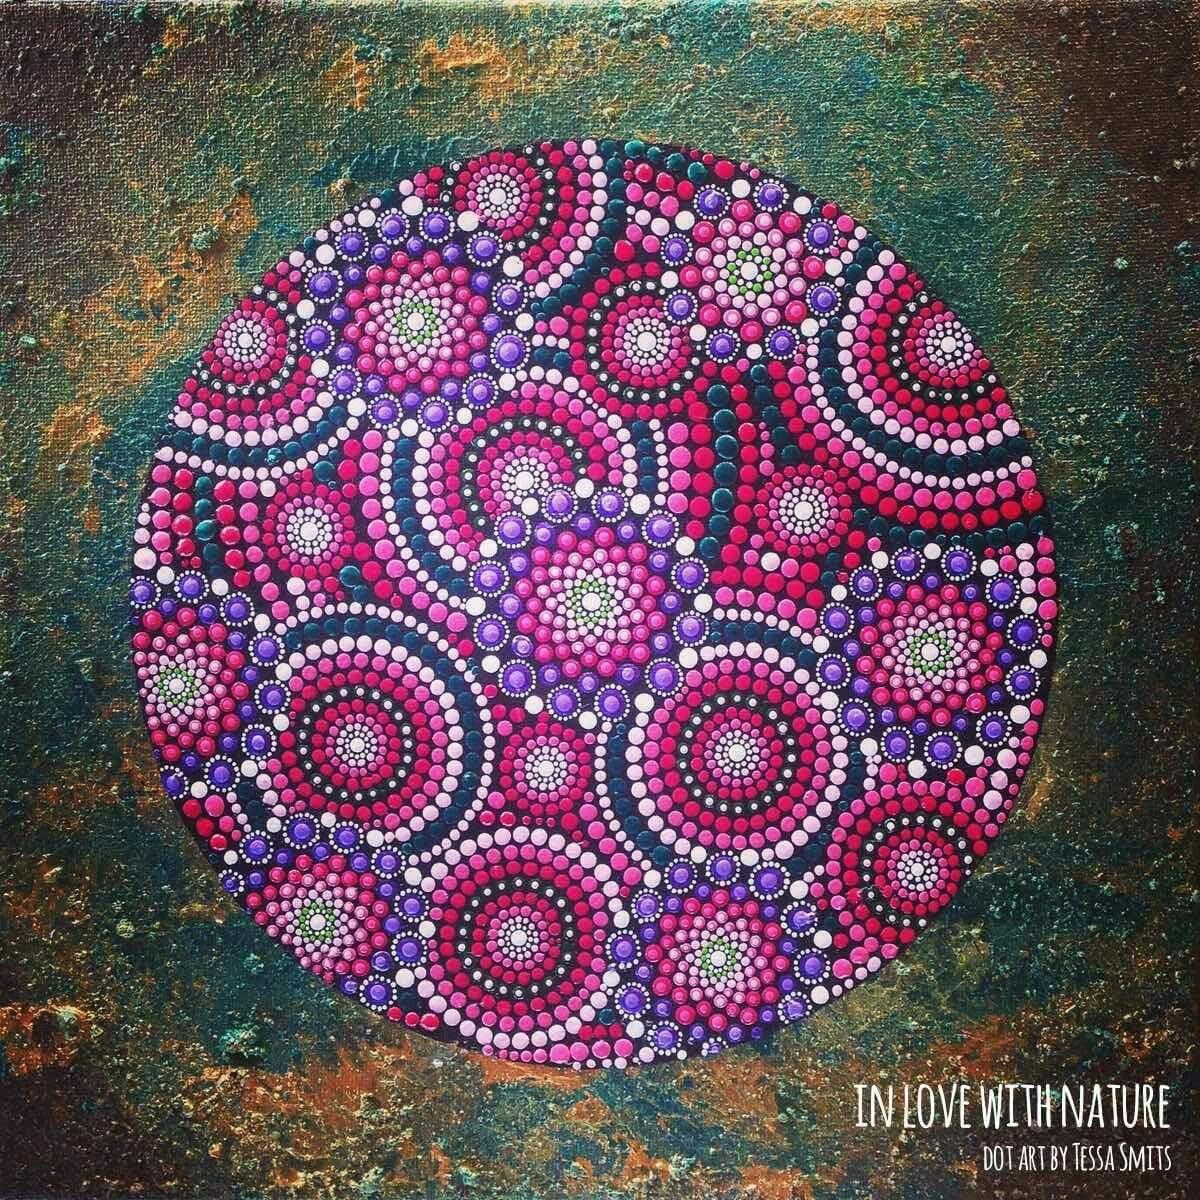 Pin by Luchik on Точечная роспись 6 | Pinterest | Mandalas, Mandala ...